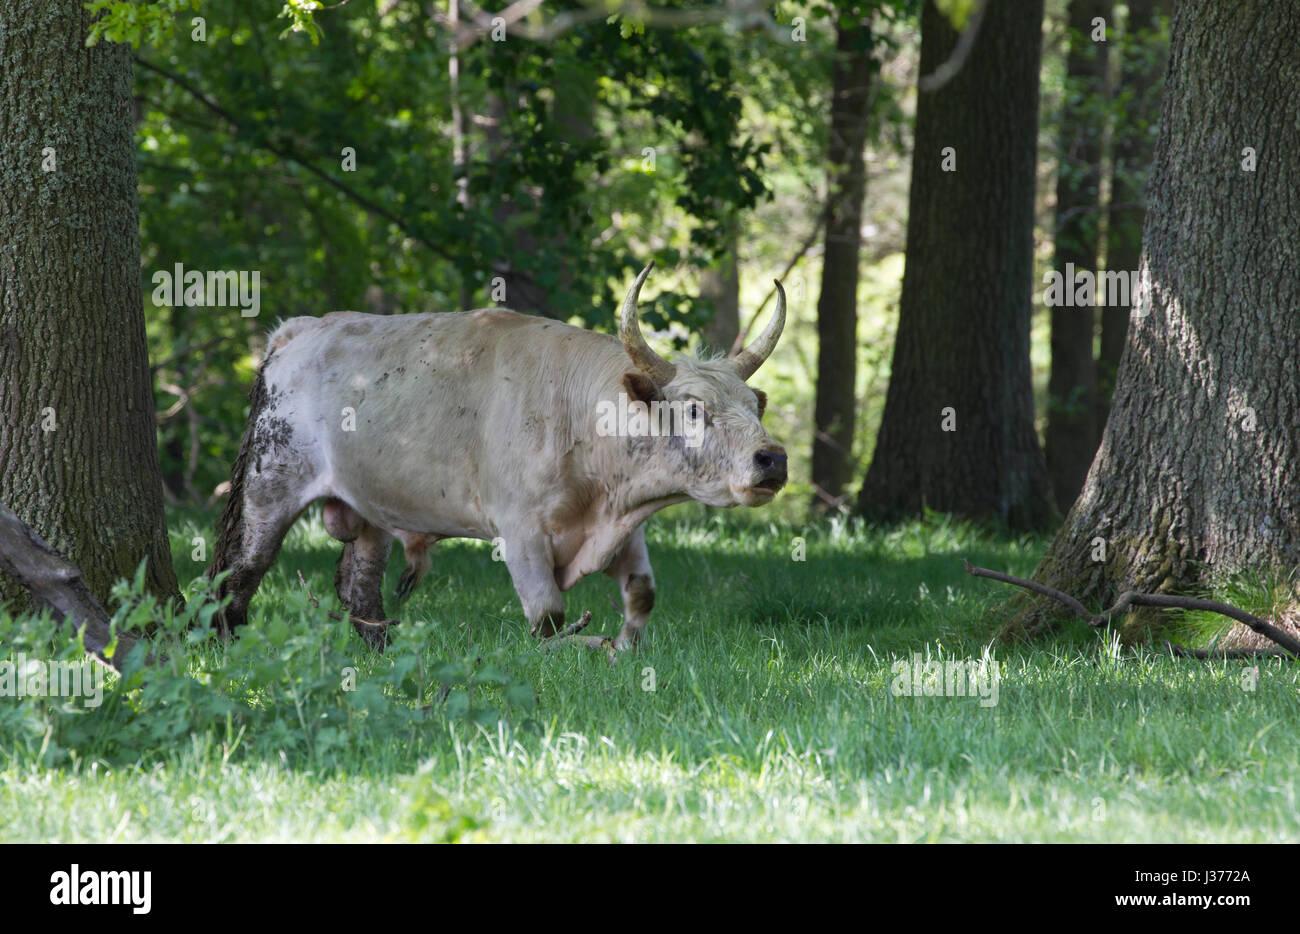 Chillingham  Wild White Cattle, single adult male roaring in woodland. Chillingham Estate, Northumberland, UK. - Stock Image